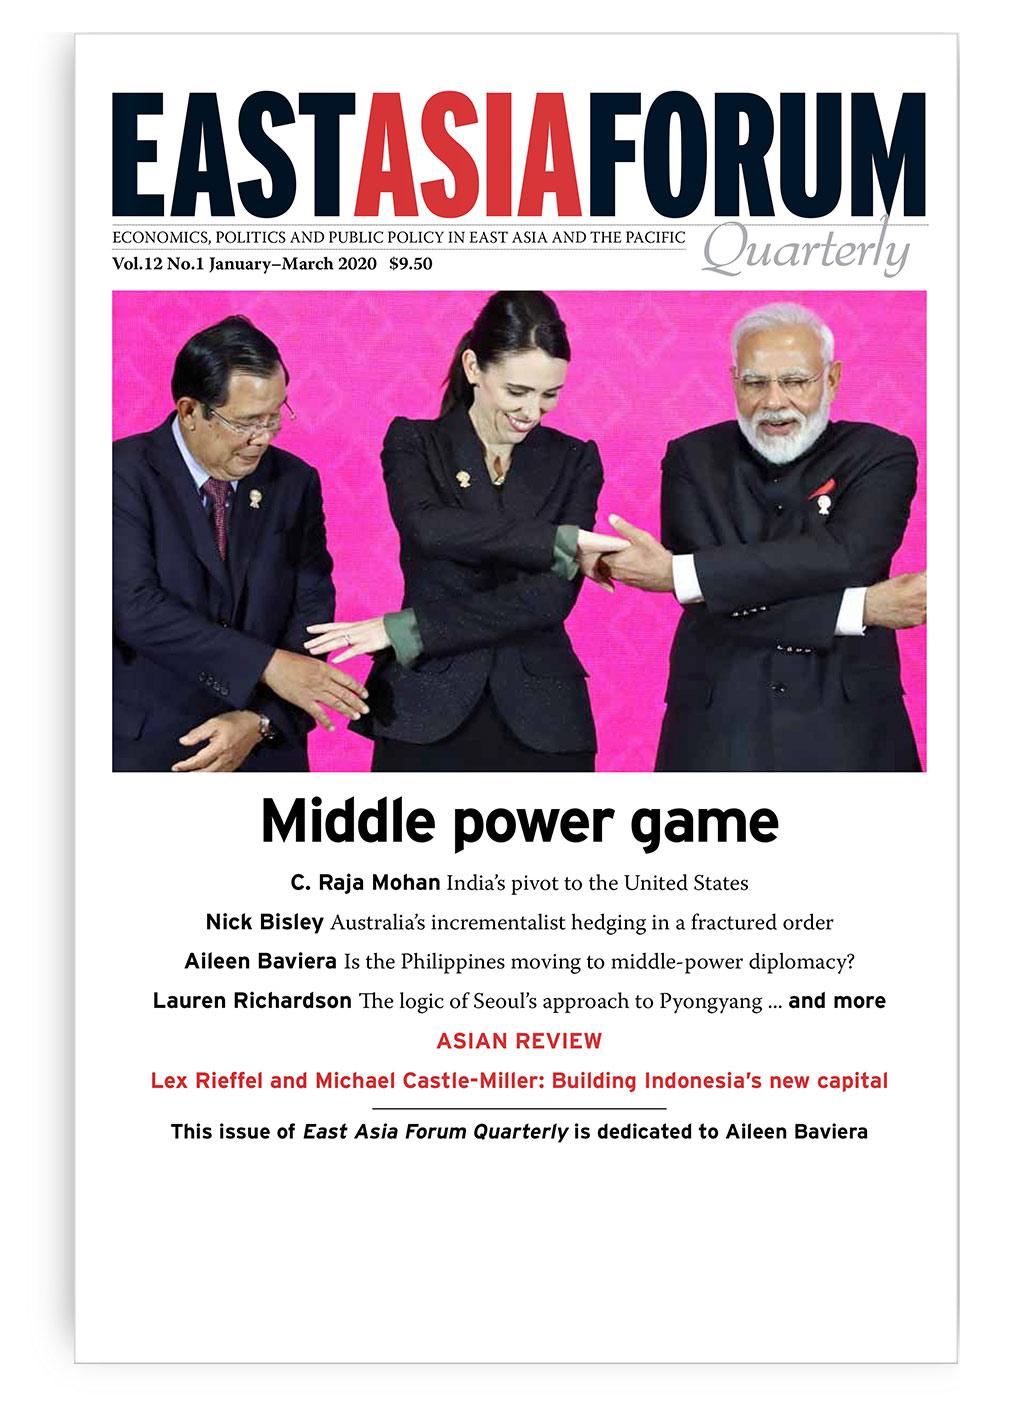 East Asia Forum Quarterly: Volume 12, Number 1, 2020